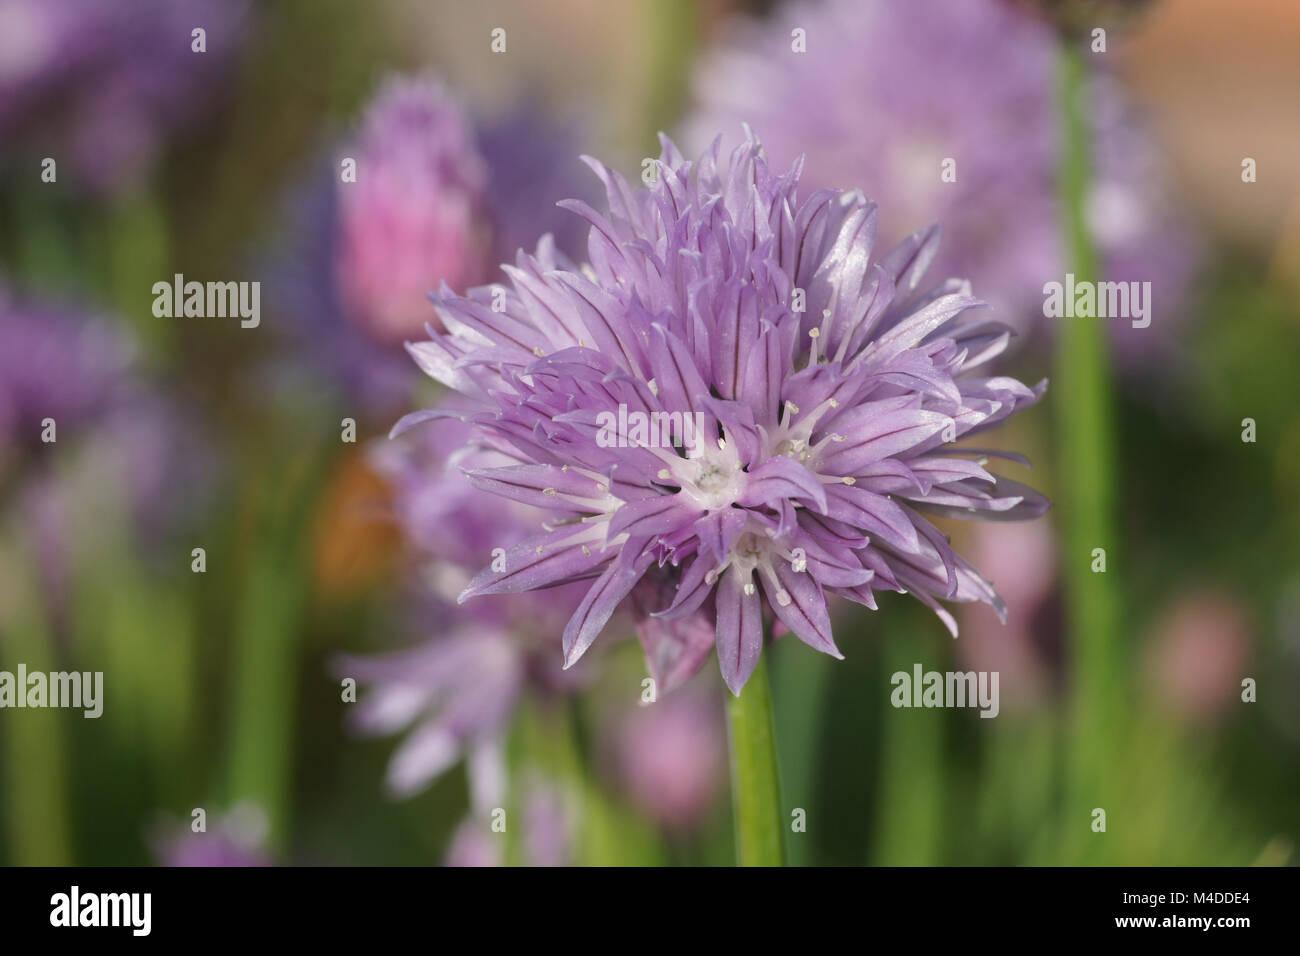 Allium schoenoprasum, Chives Stock Photo